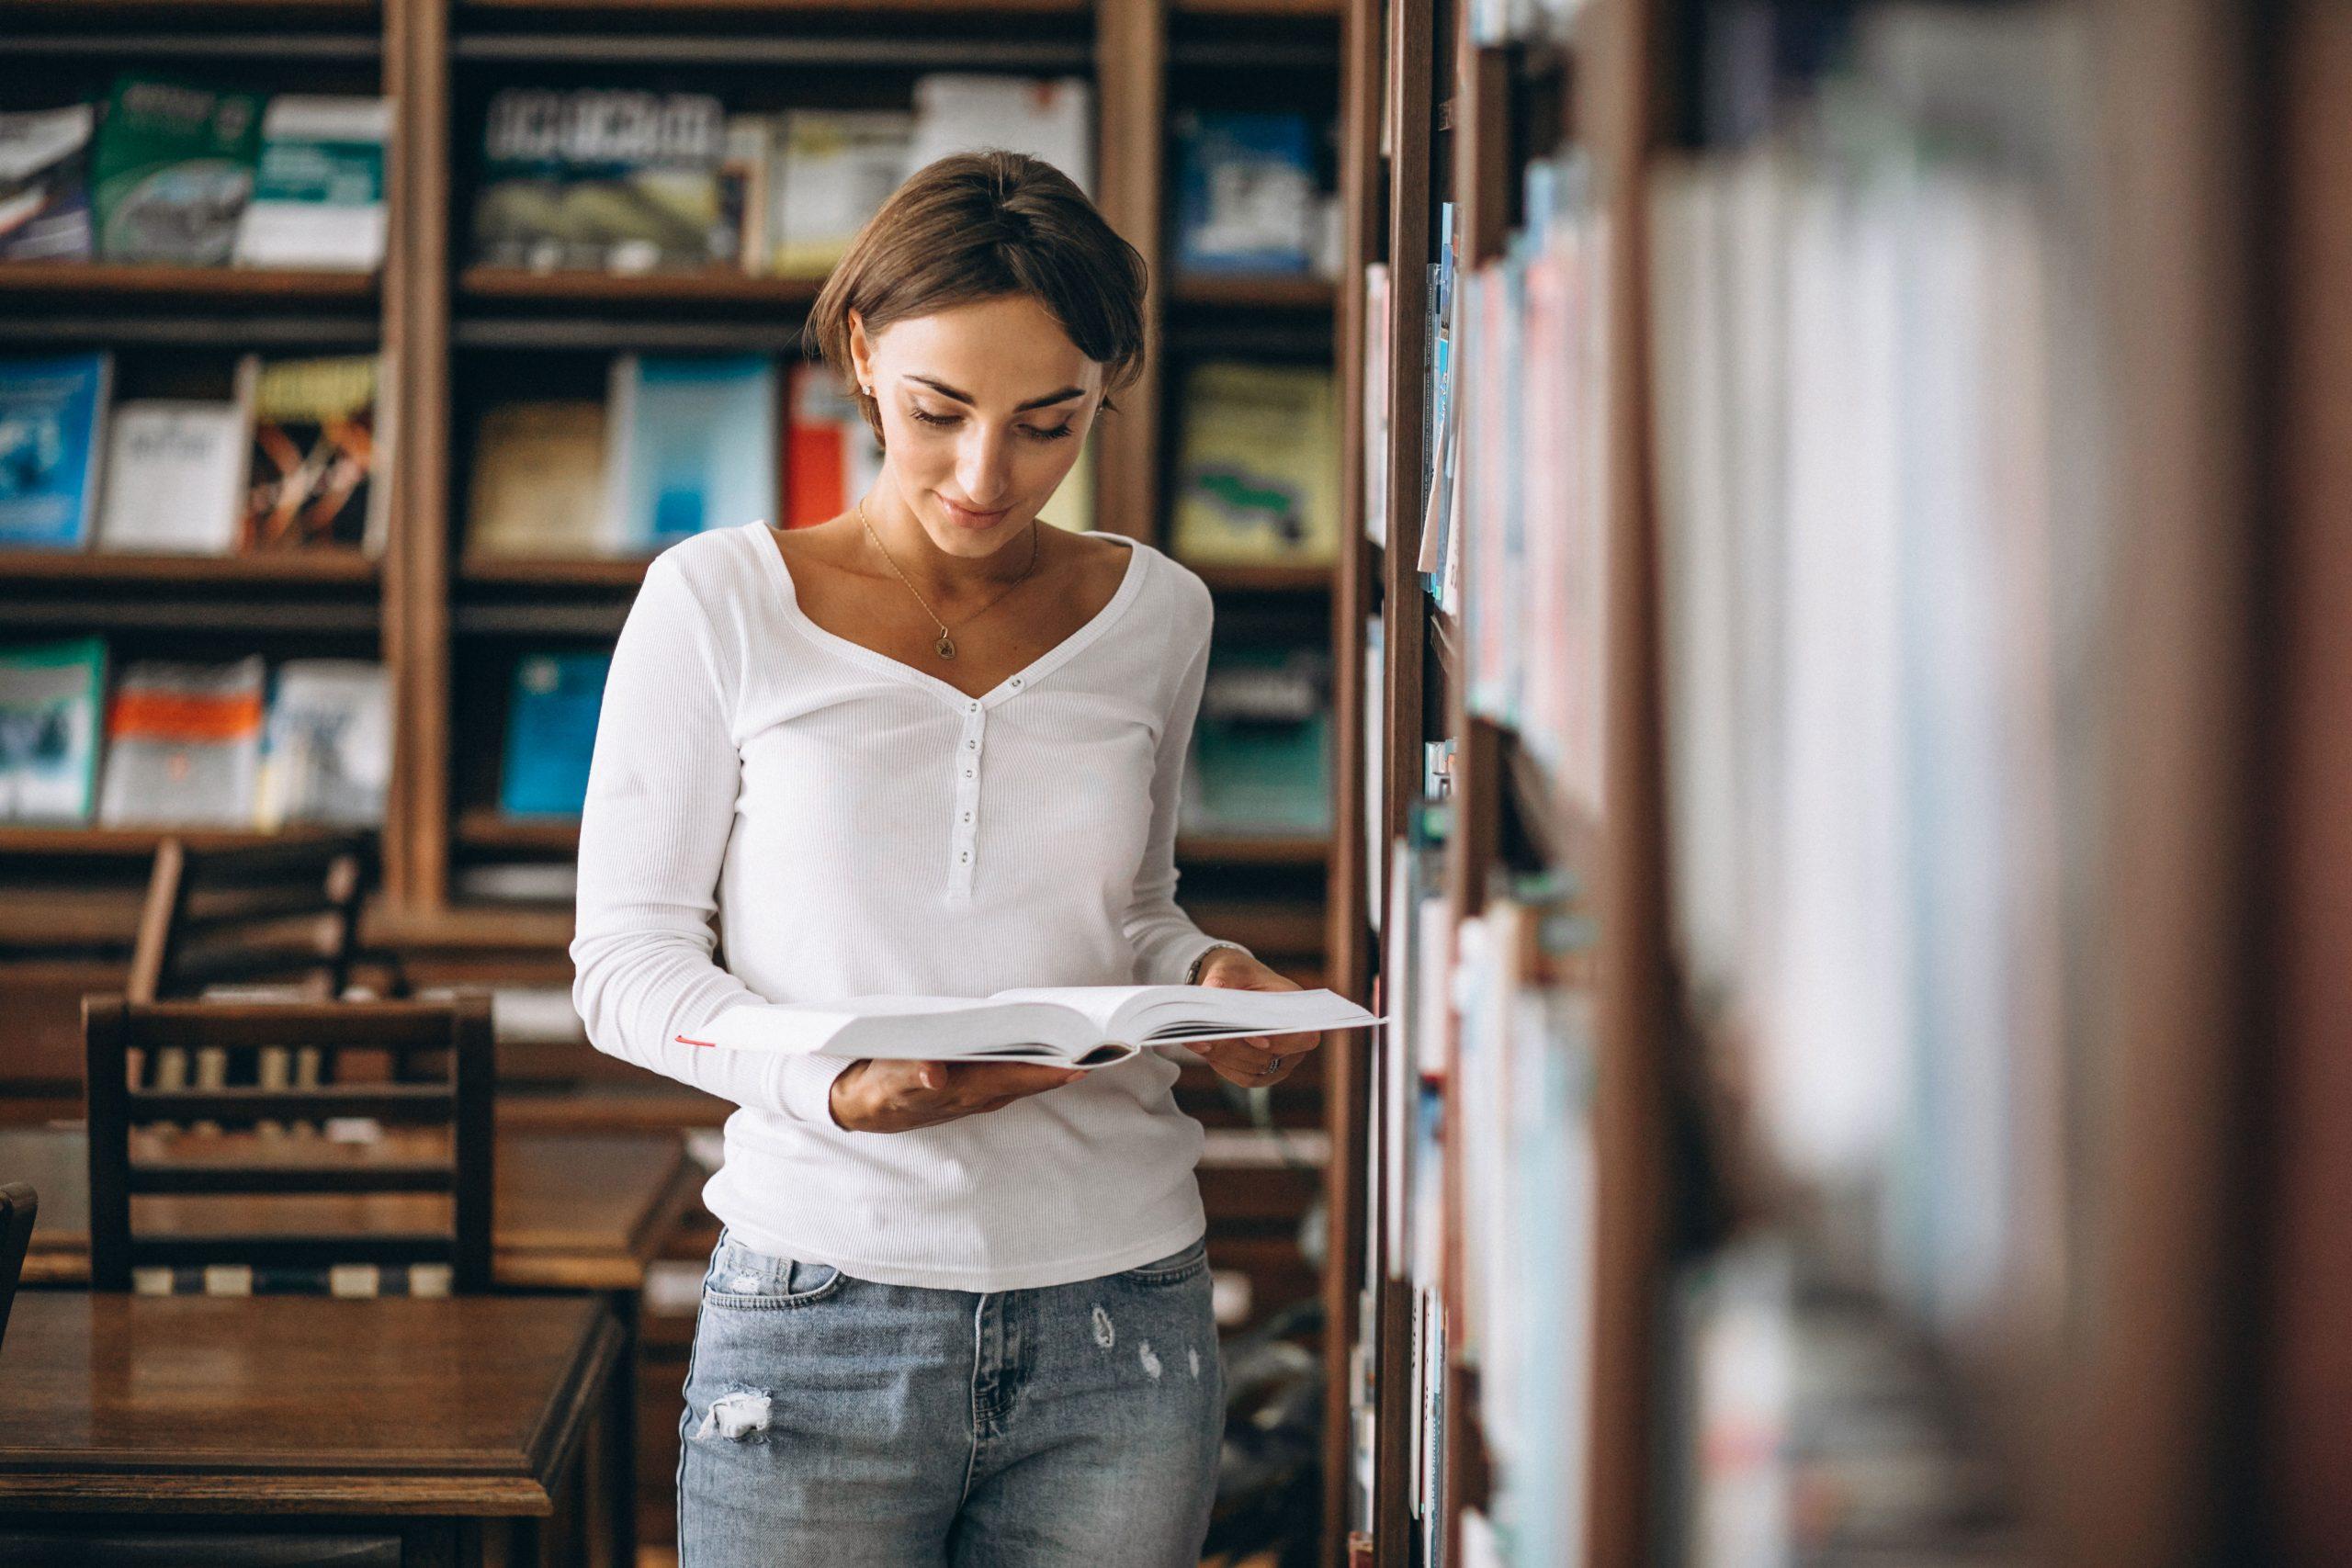 oferta empleo público parcial universidad complutense madrid.